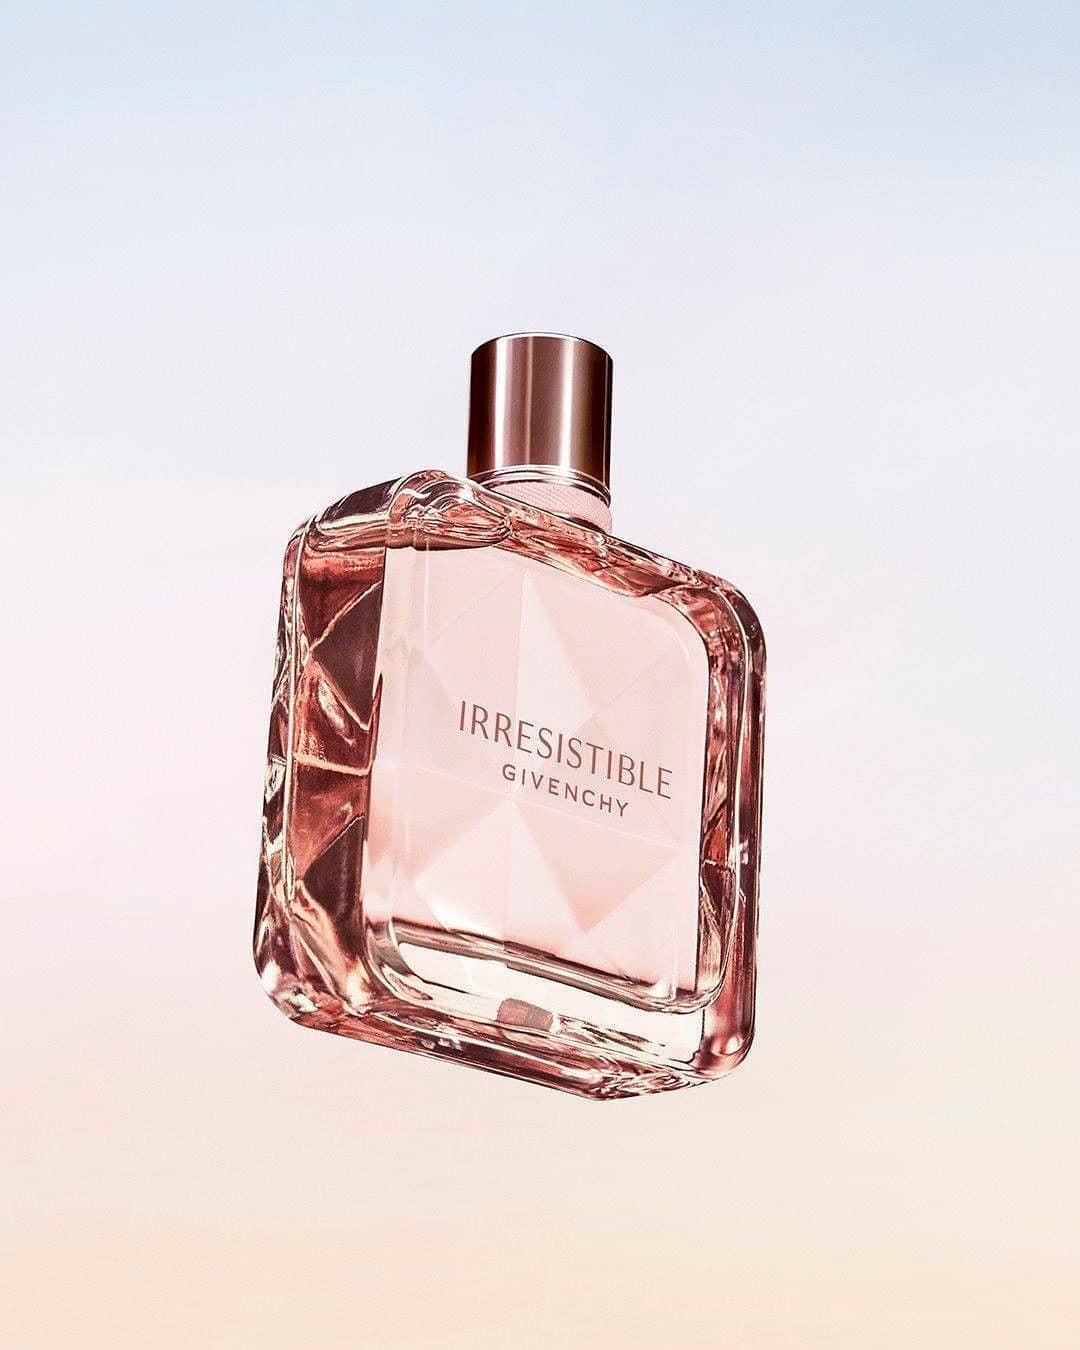 Givenchy Irrésistible Eau de Parfum - المصدر انستغرام جيفنشي